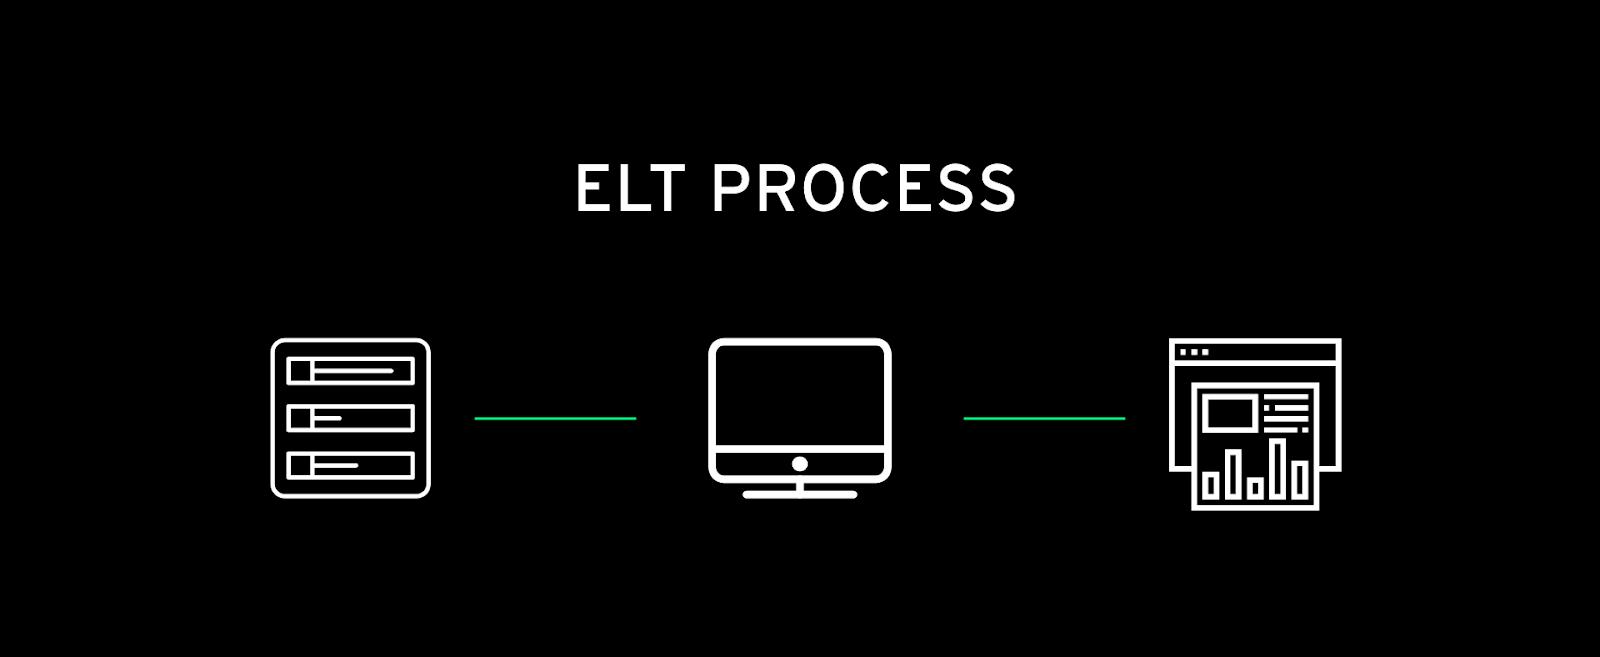 An ELT process diagram